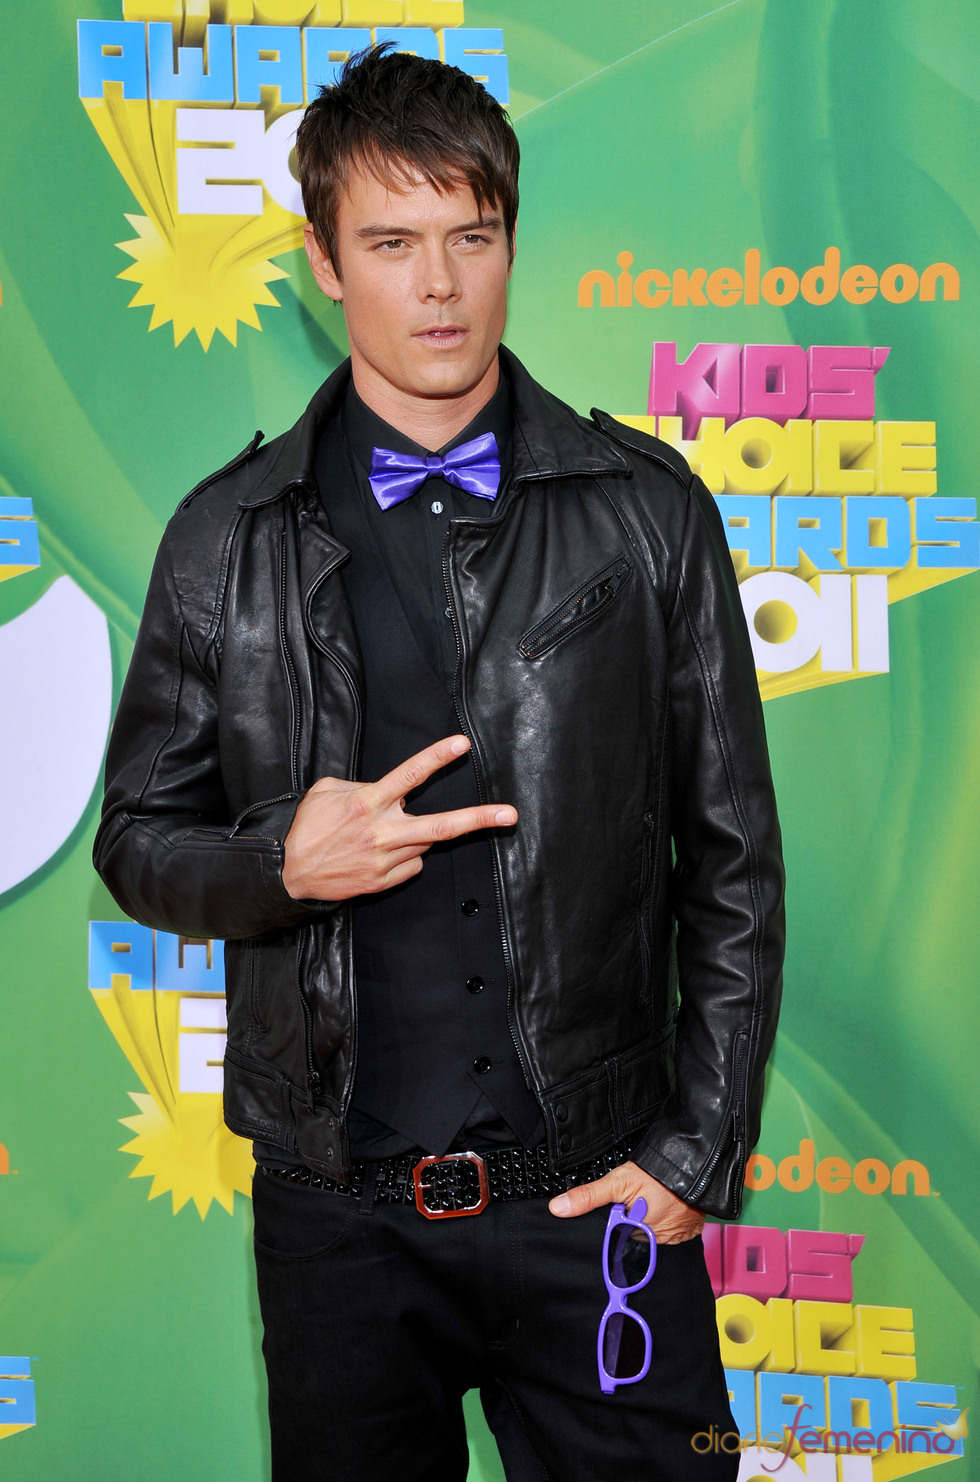 Josh Duhamel en la alfombra roja de los Kids' Choice Awards